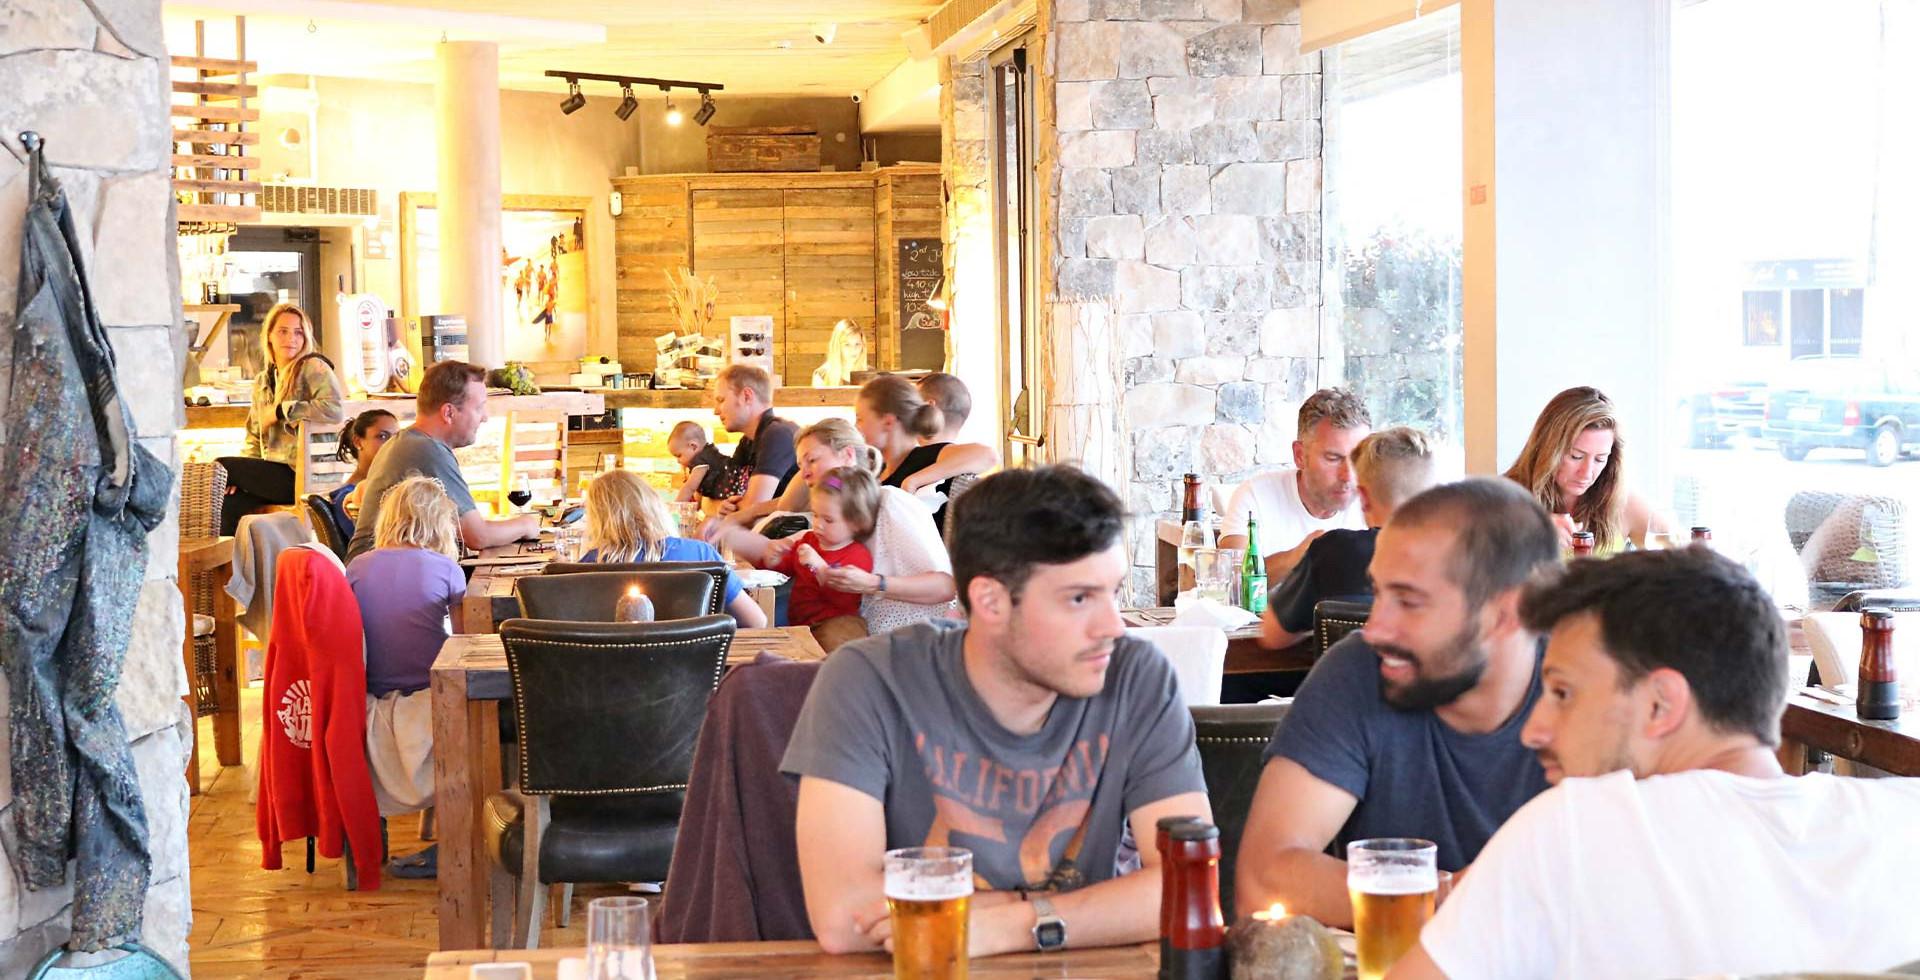 Restaurant, Bar & Cafe